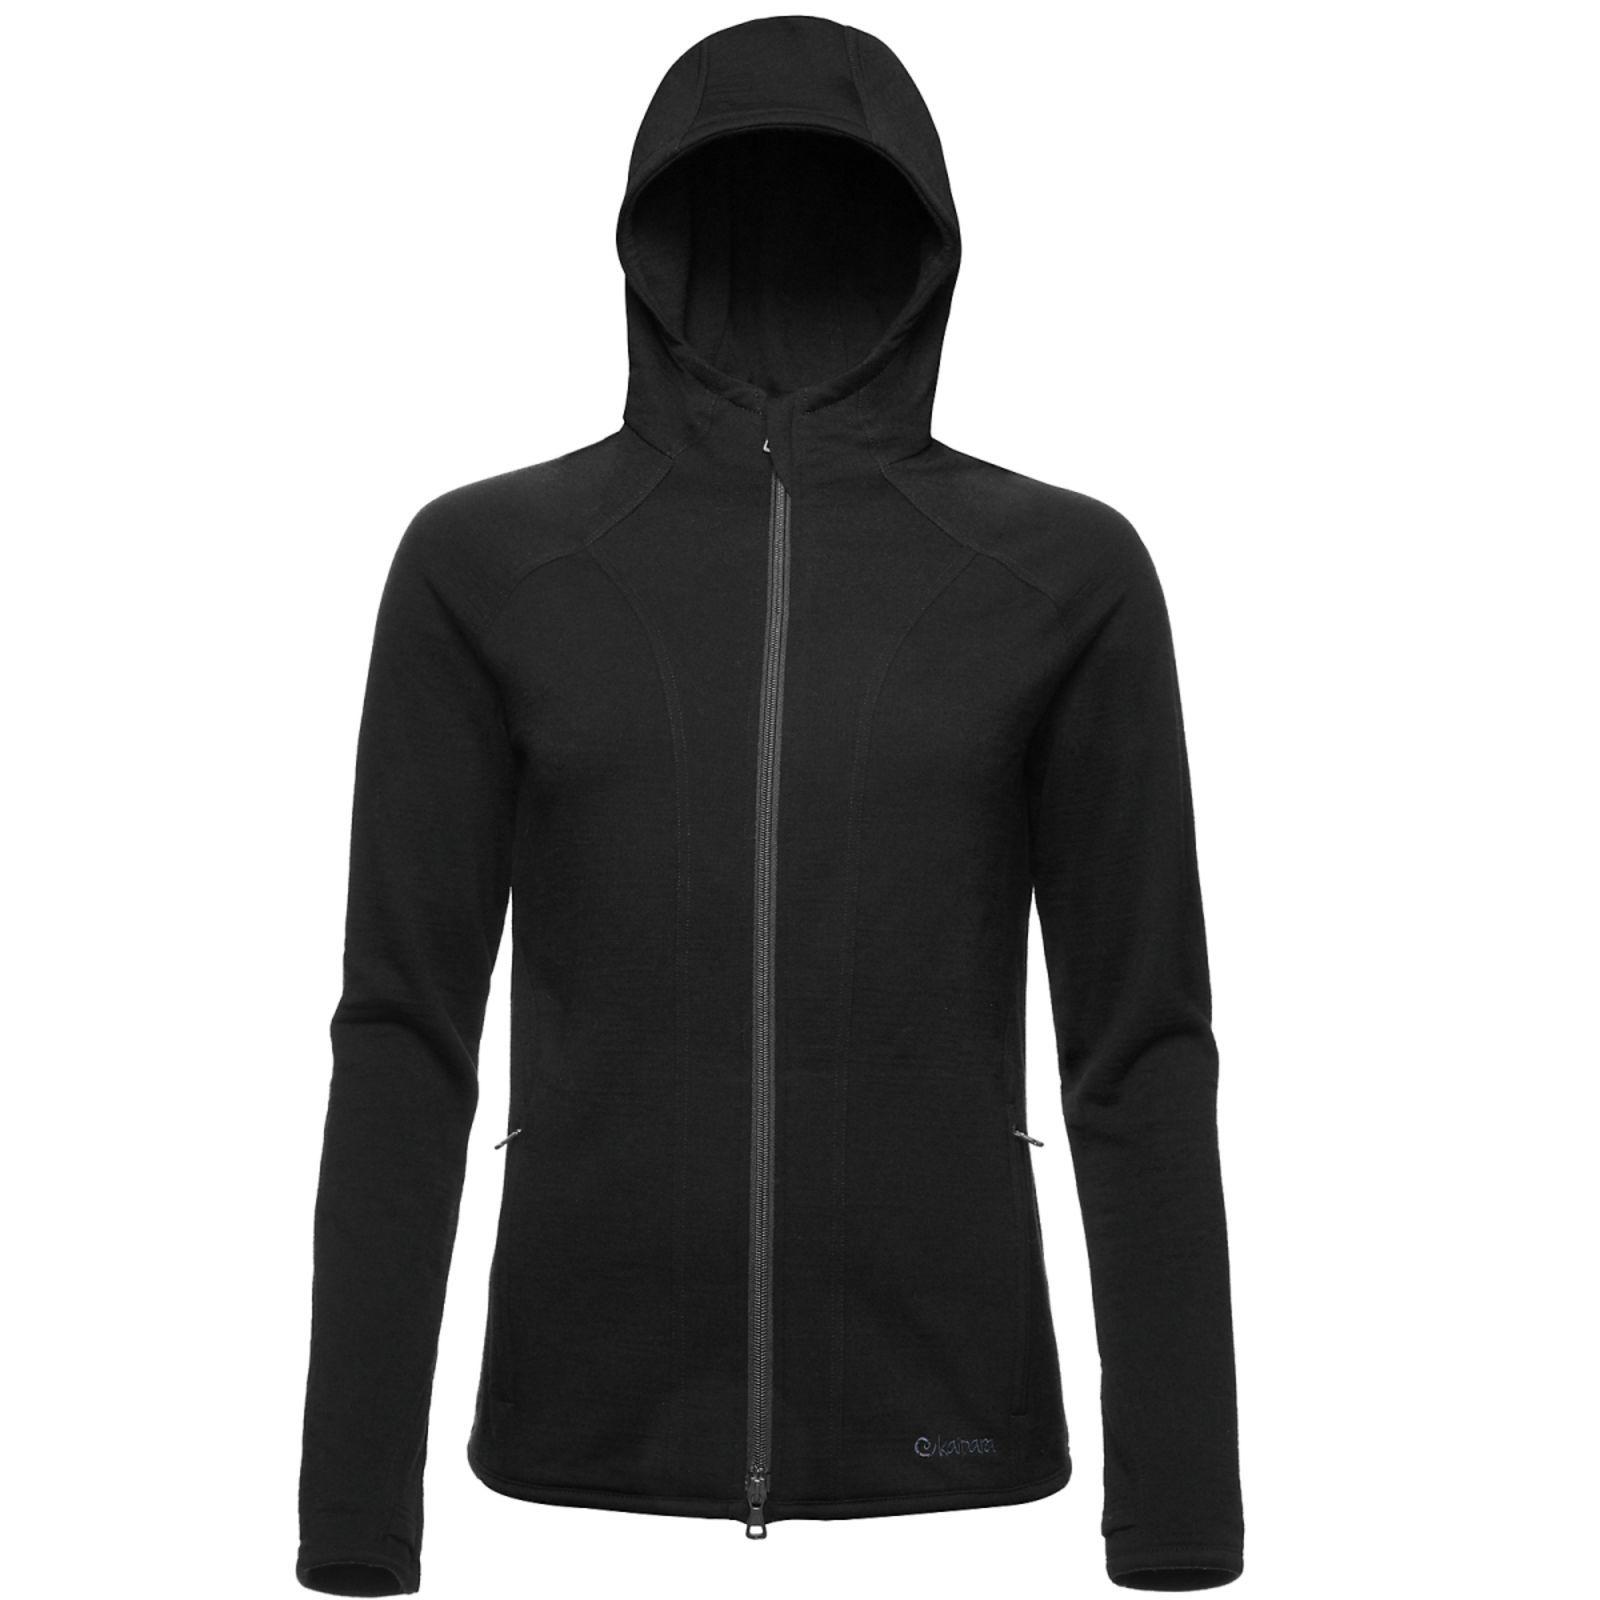 Merino Hoody Sweat Jacke Damen 270 Schwarz / M